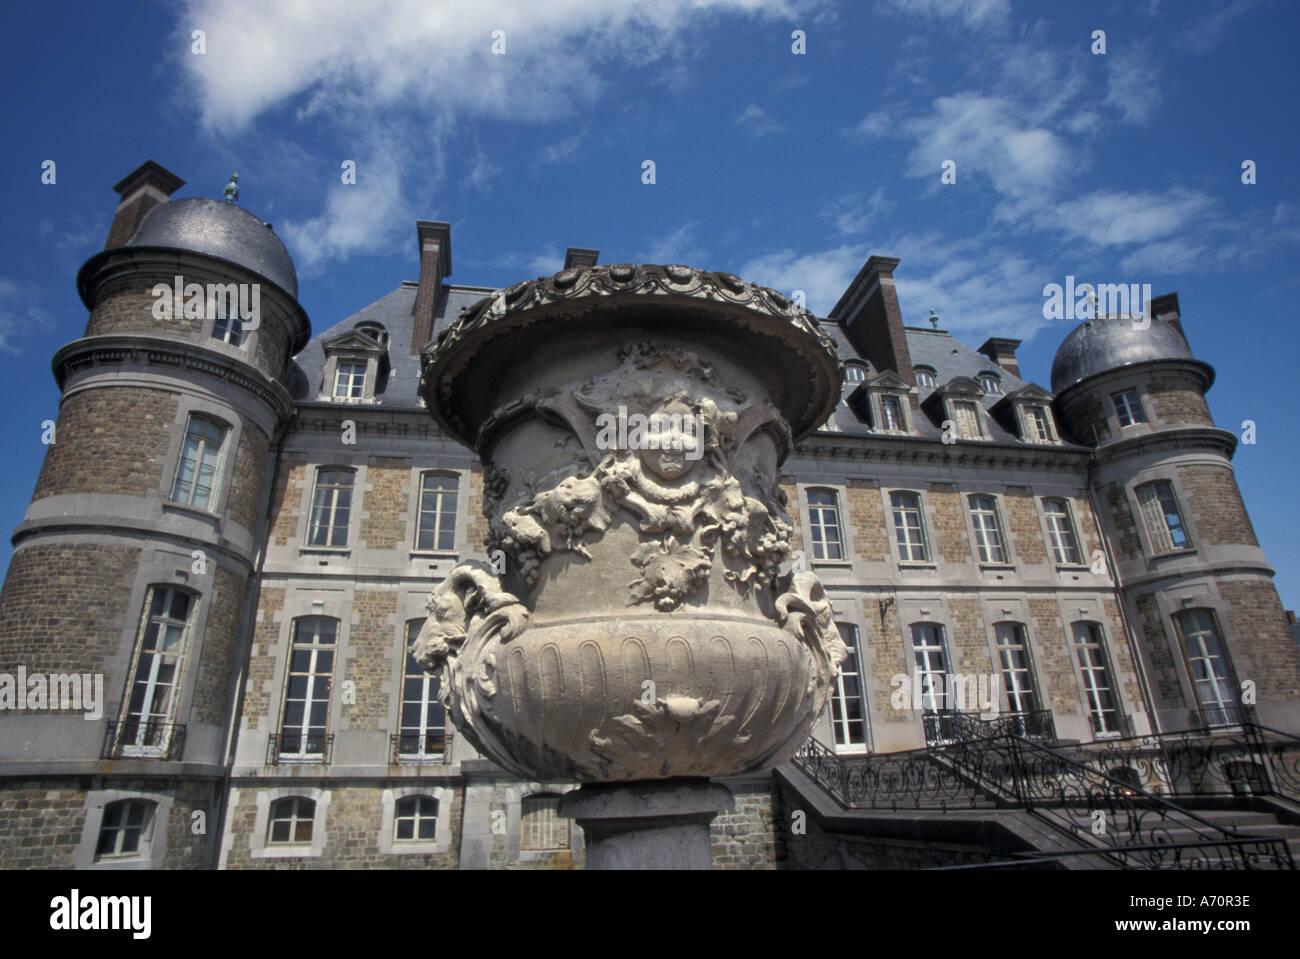 EUROPE, Belgium, Beloeil Castle - Stock Image